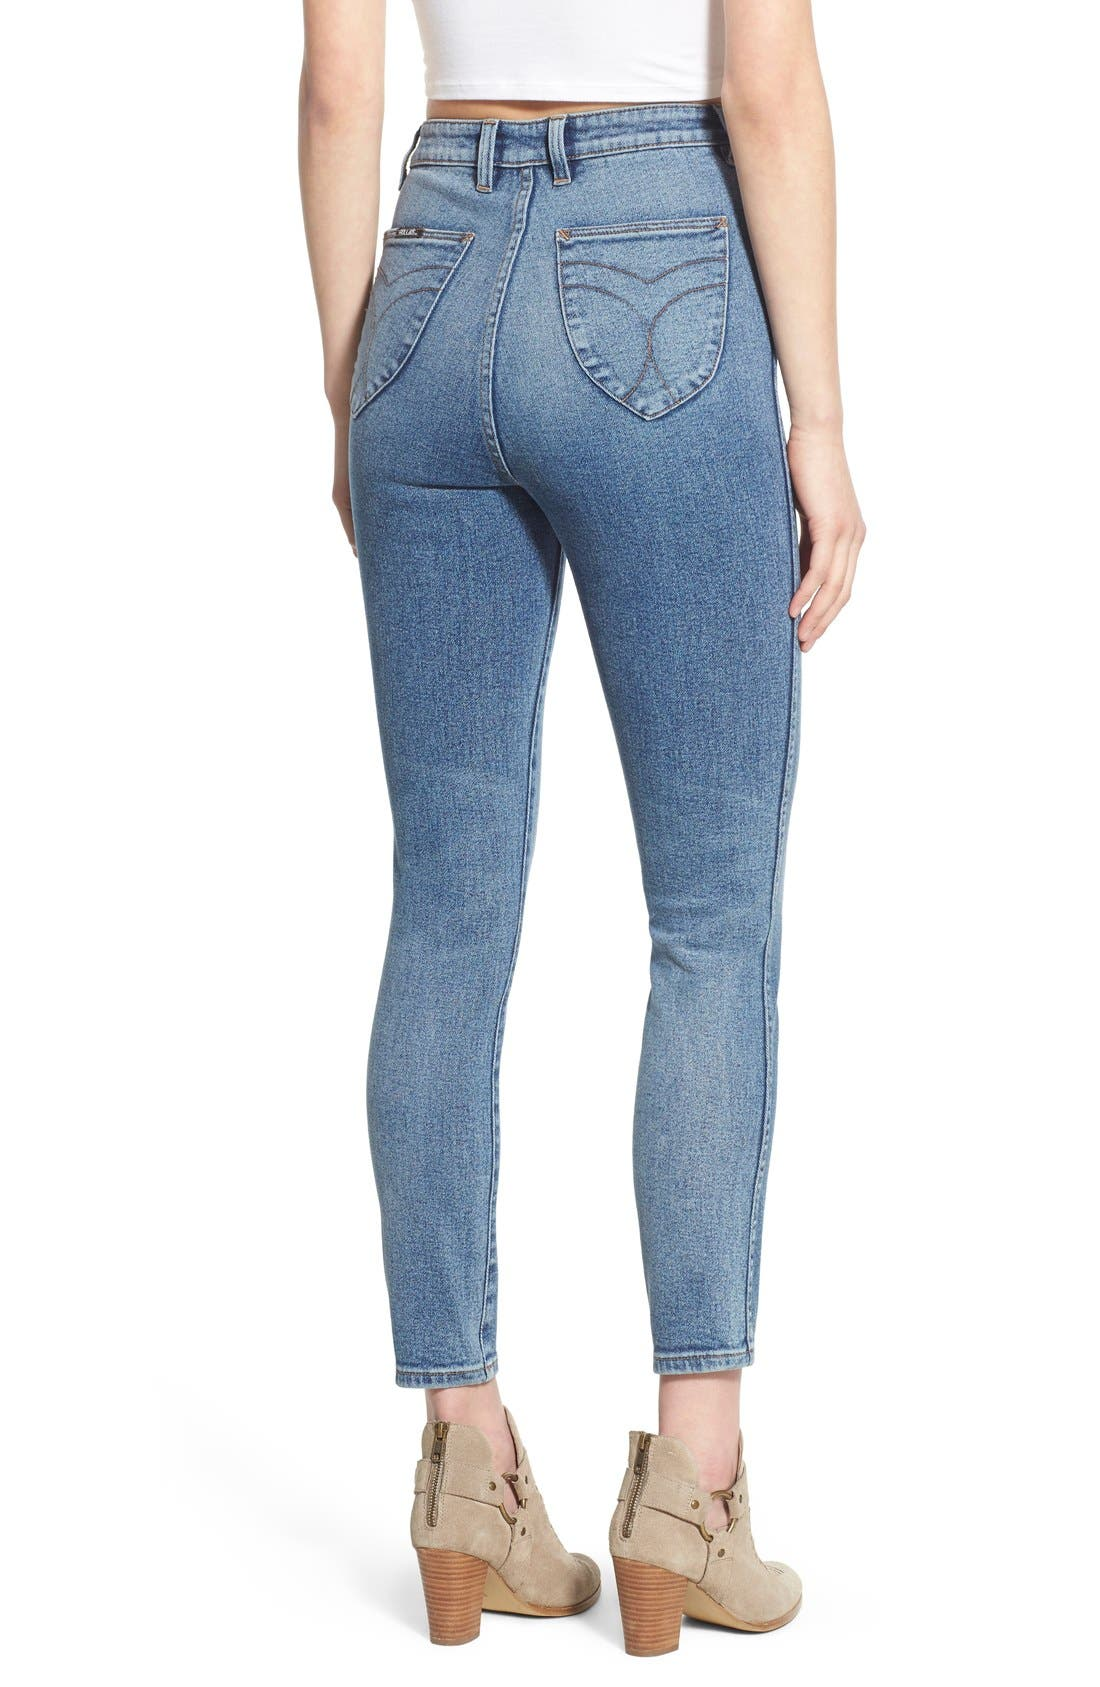 Alternate Image 2  - Rolla's 'East Coast' High Rise Ankle Skinny Jeans (Folk Blue)